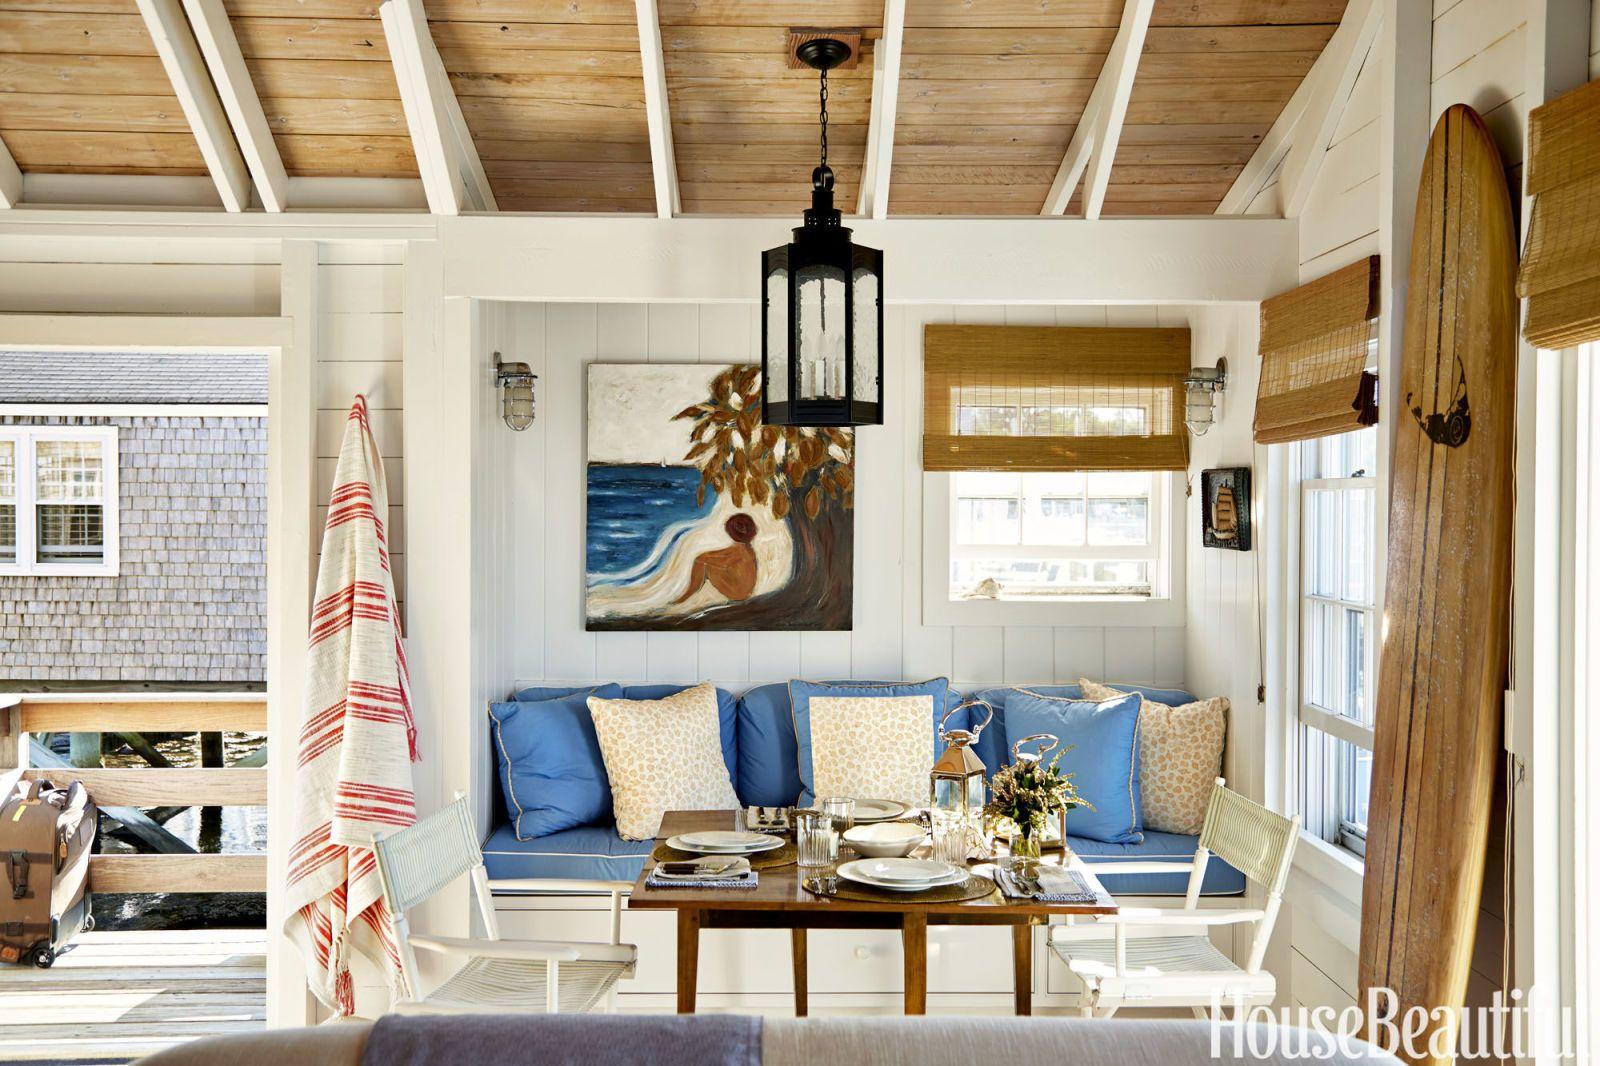 17 Coastal Decor Ideas for a Beachy Breezy Home Coastal House